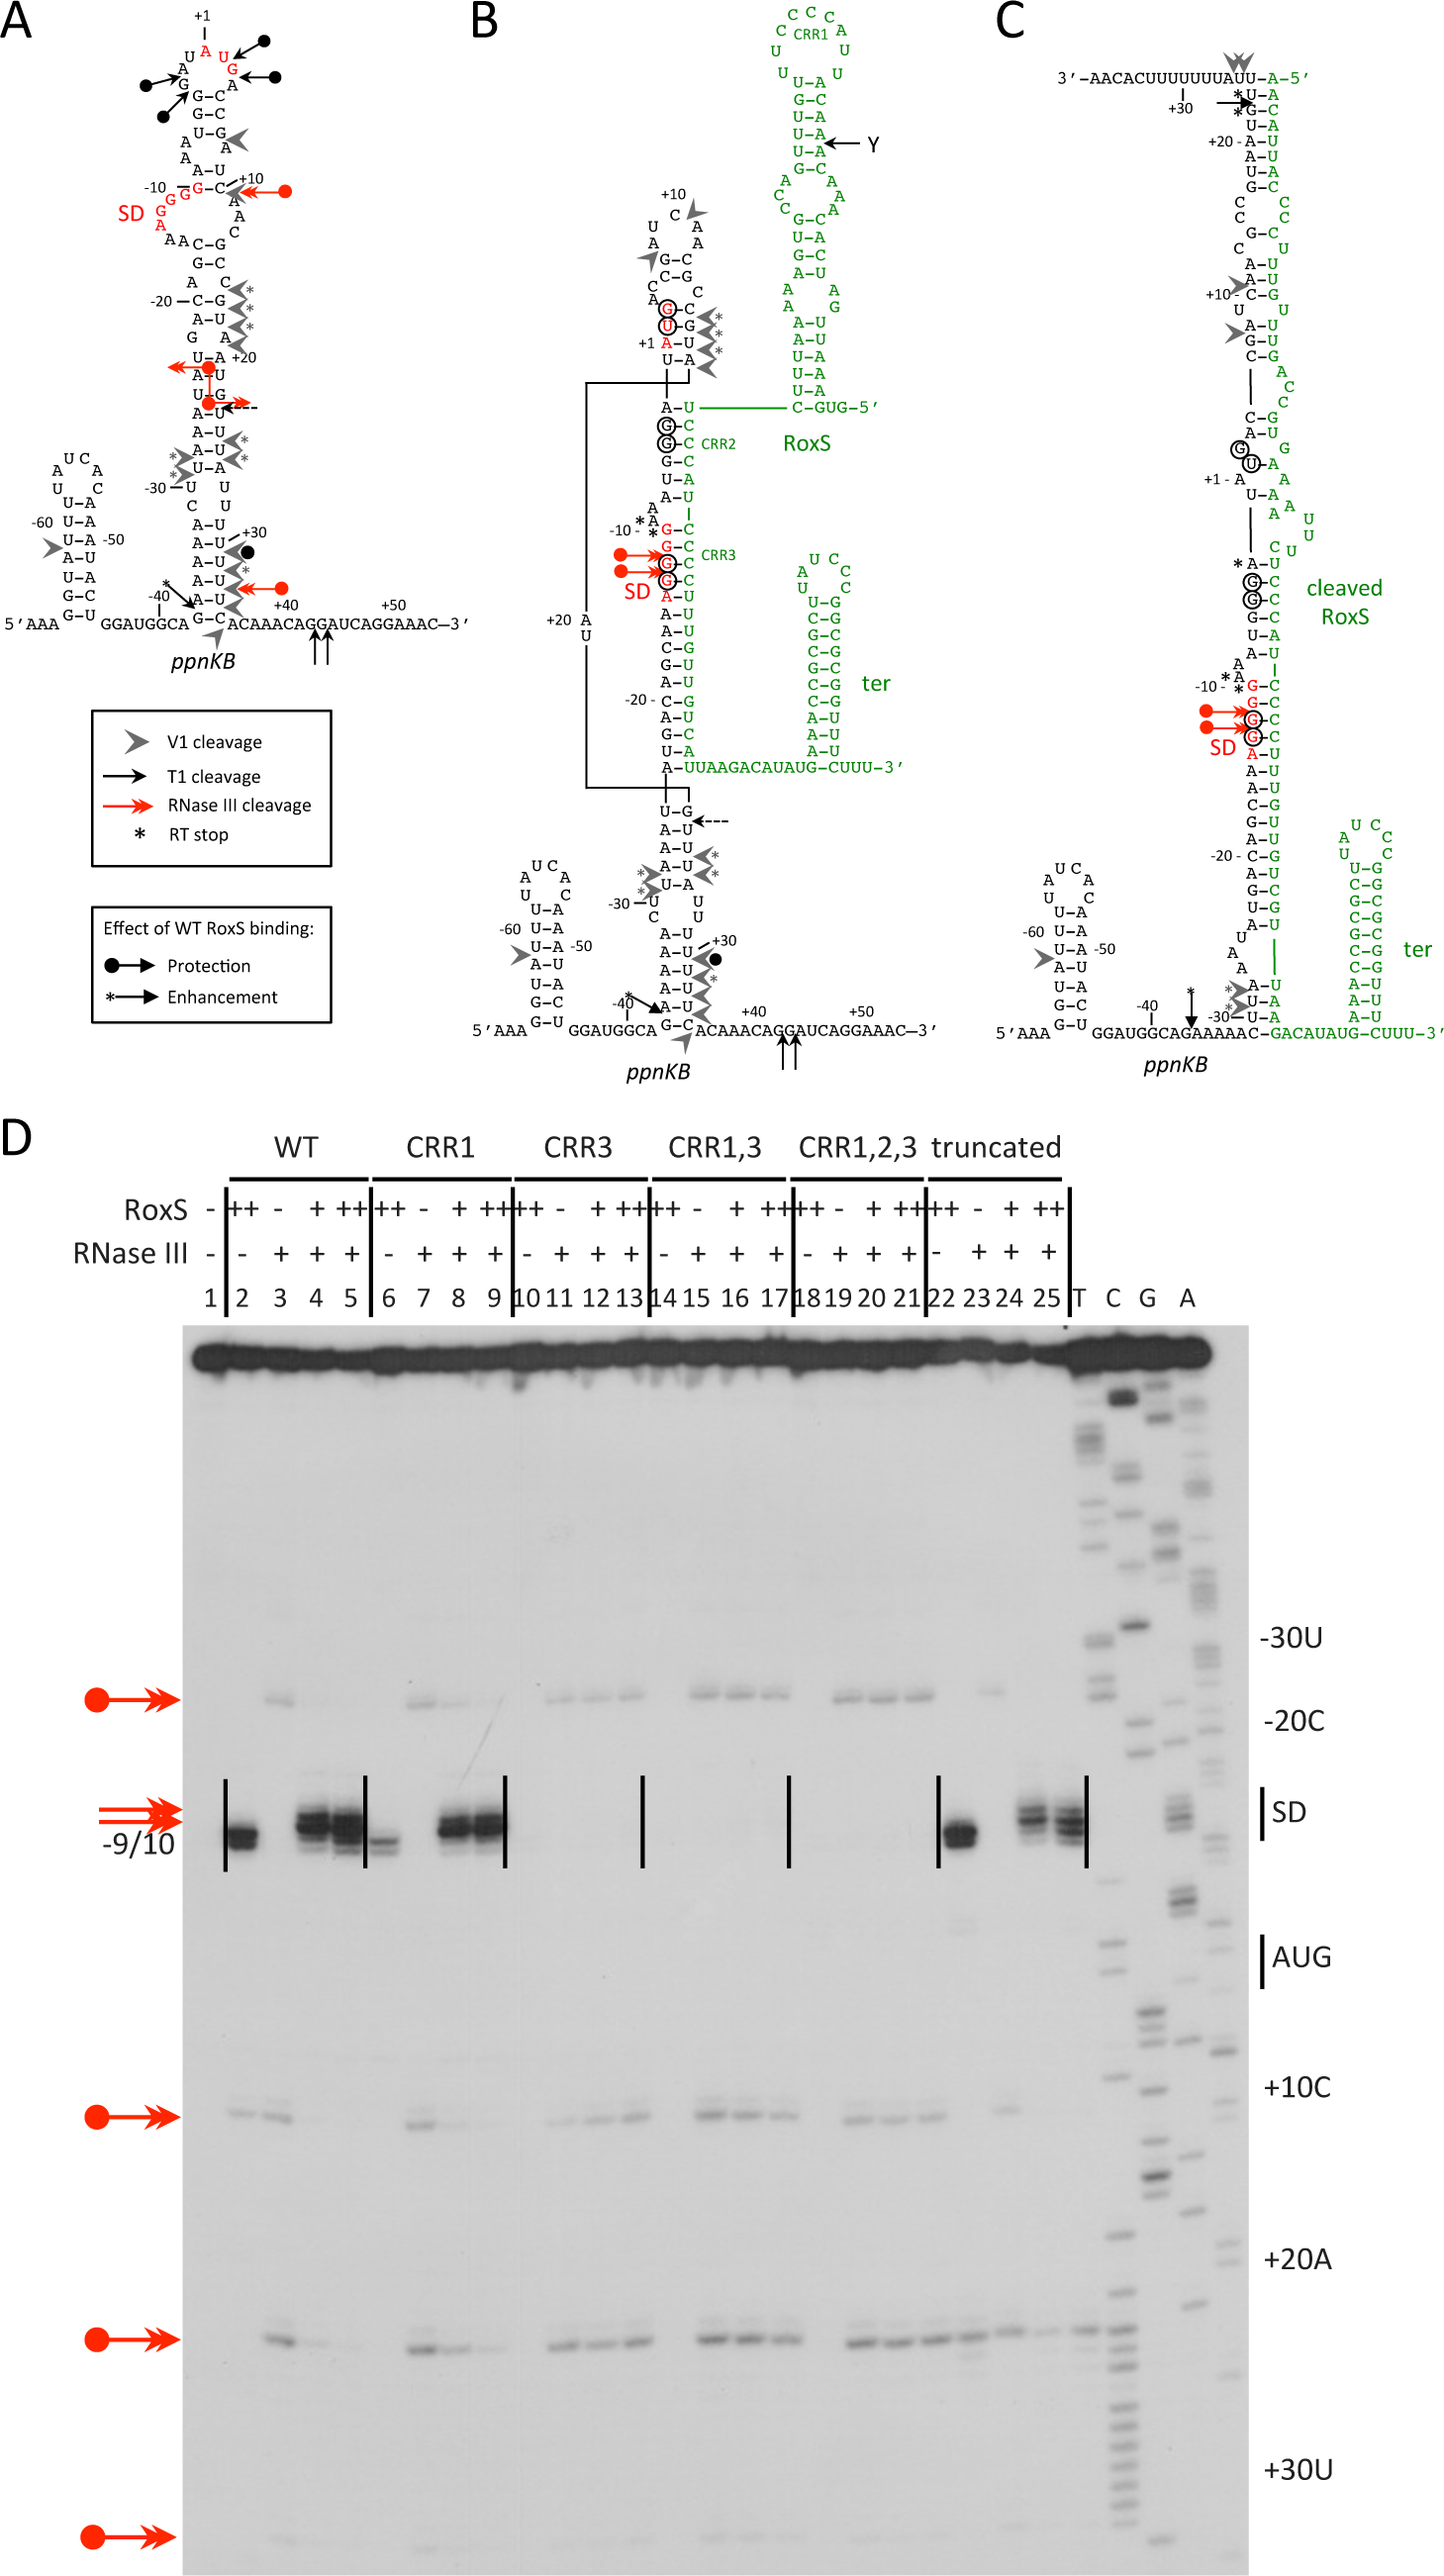 RNase III cleaves the <i>ppnKB</i>/RoxS duplex <i>in vitro</i>.